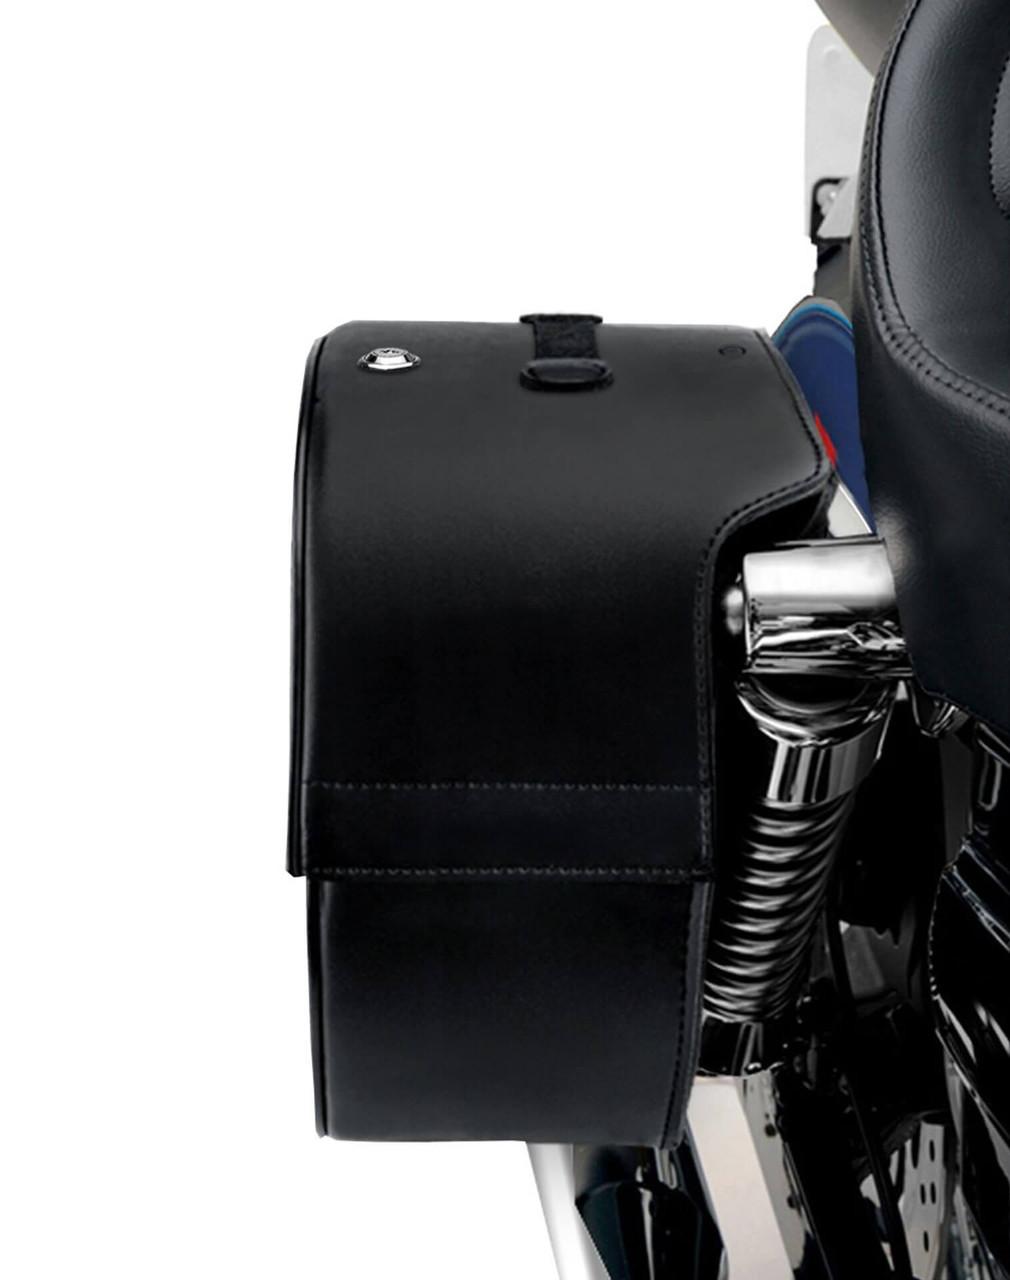 Honda VTX 1300 C Spear Shock Cutout Motorcycle Saddlebags Shock Cutout View